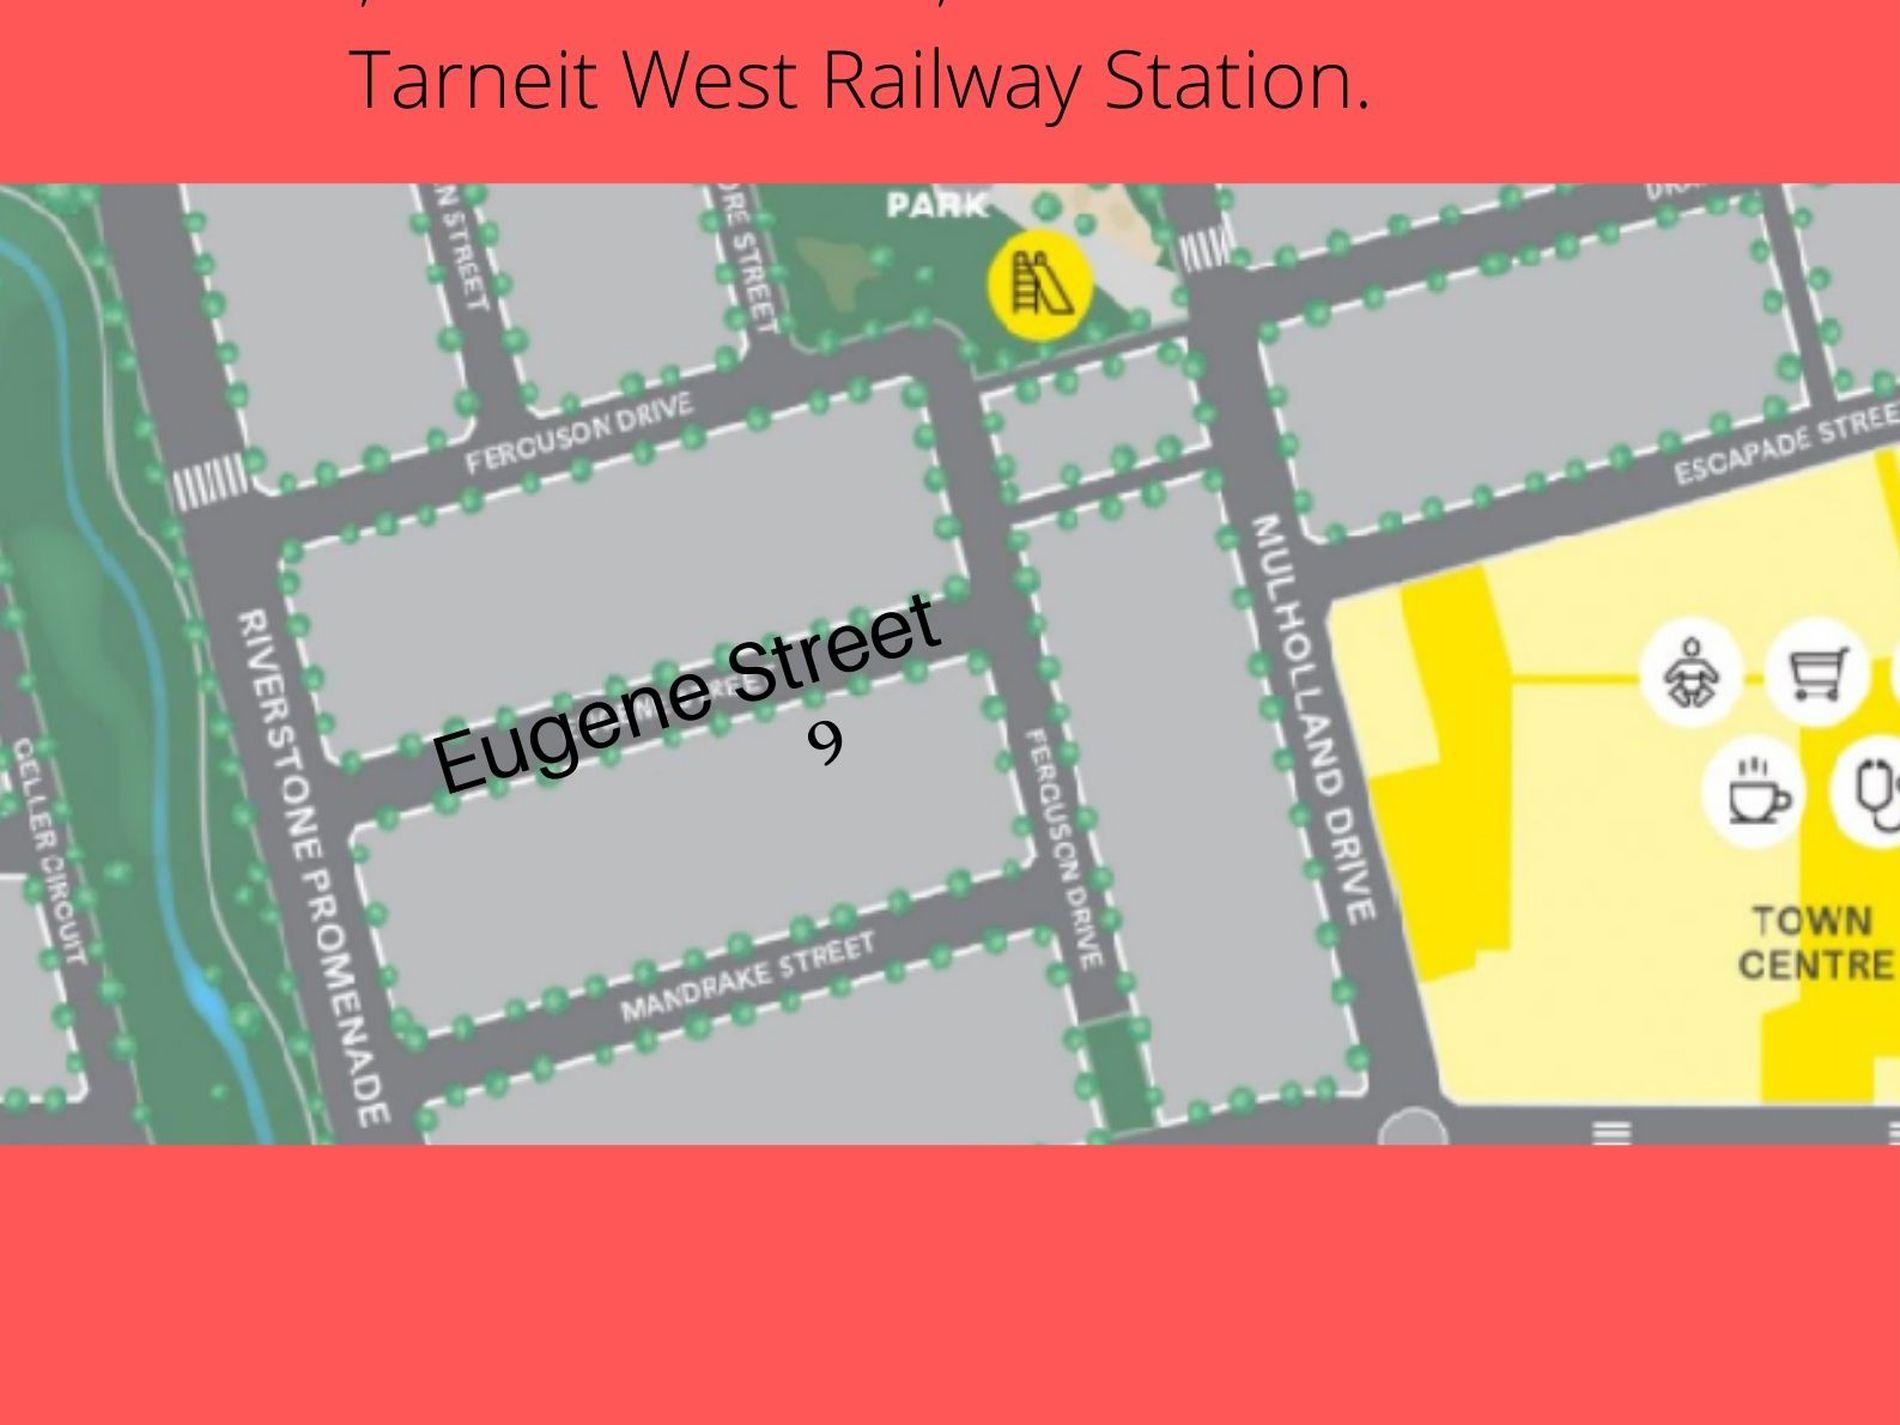 9 Eugene Street, Tarneit